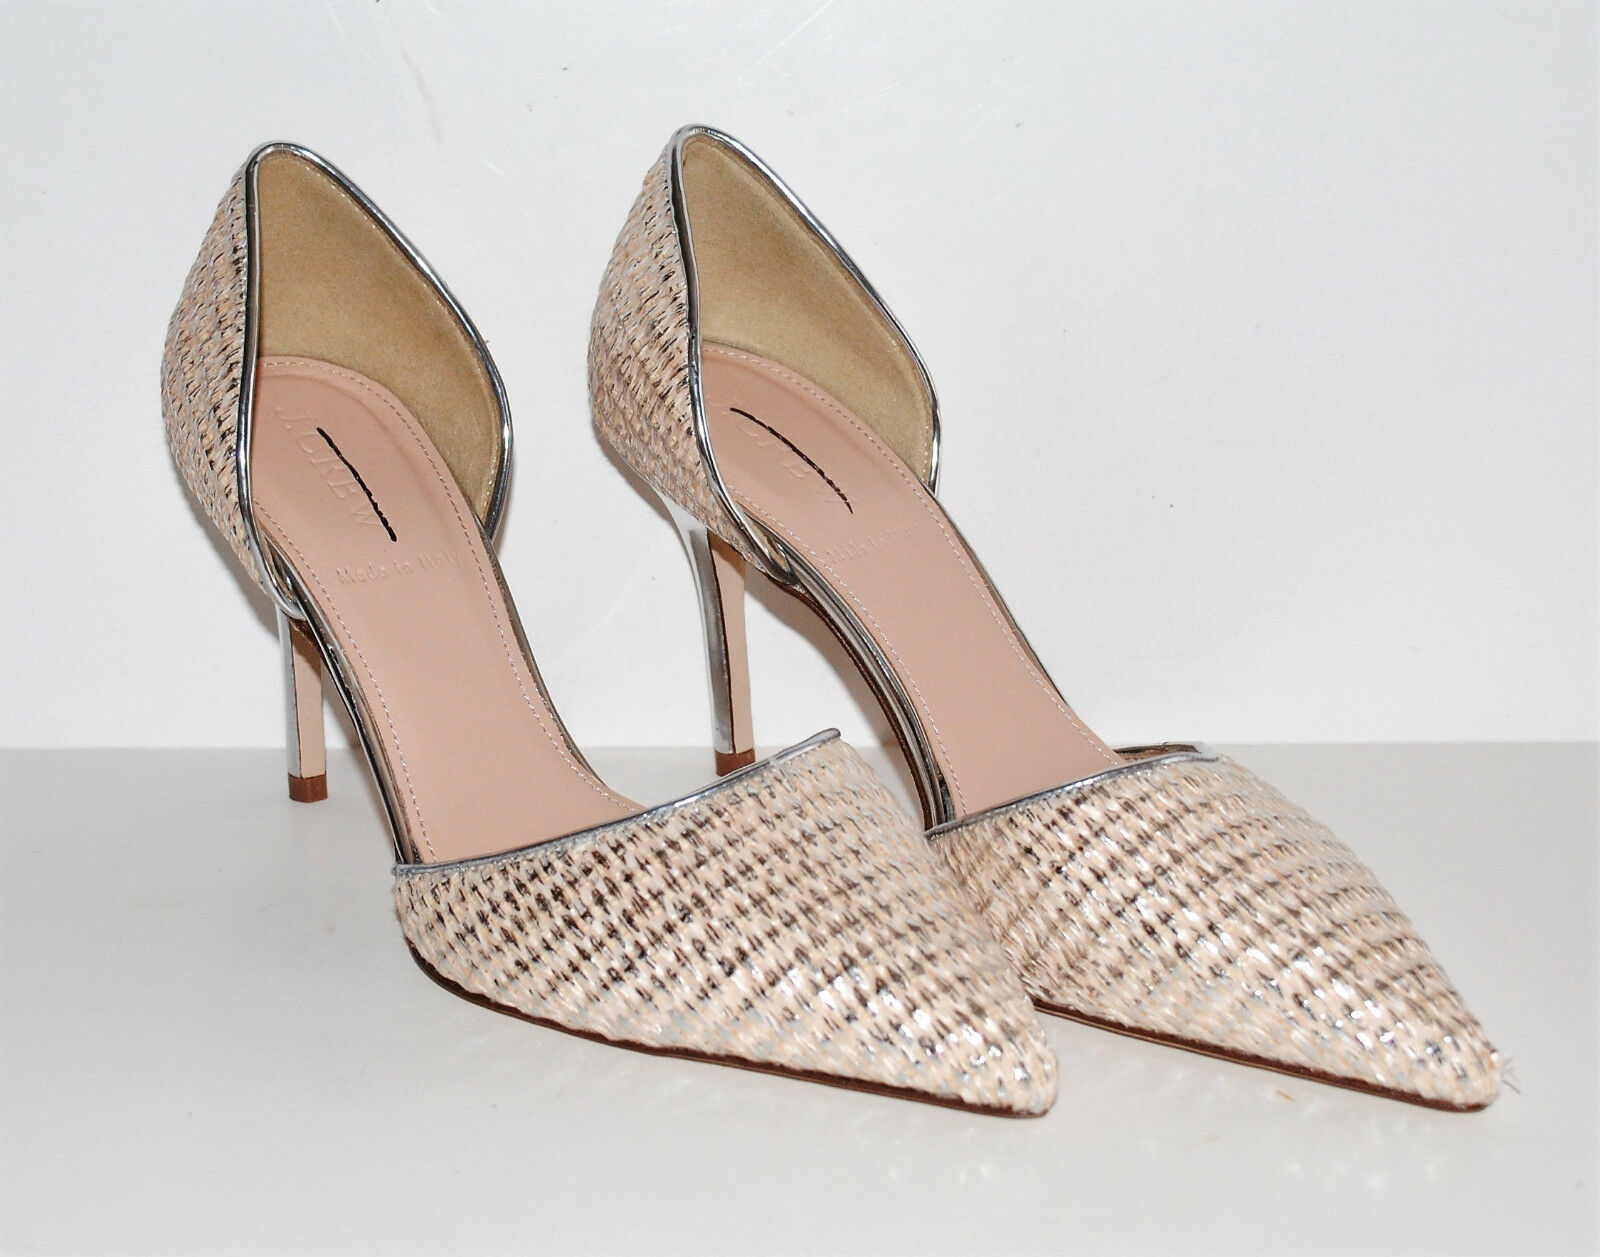 J.Crew Elsie Metallic Woven d'Orsay Pumps Heels  F1299 Ecru Silver 6.5  298